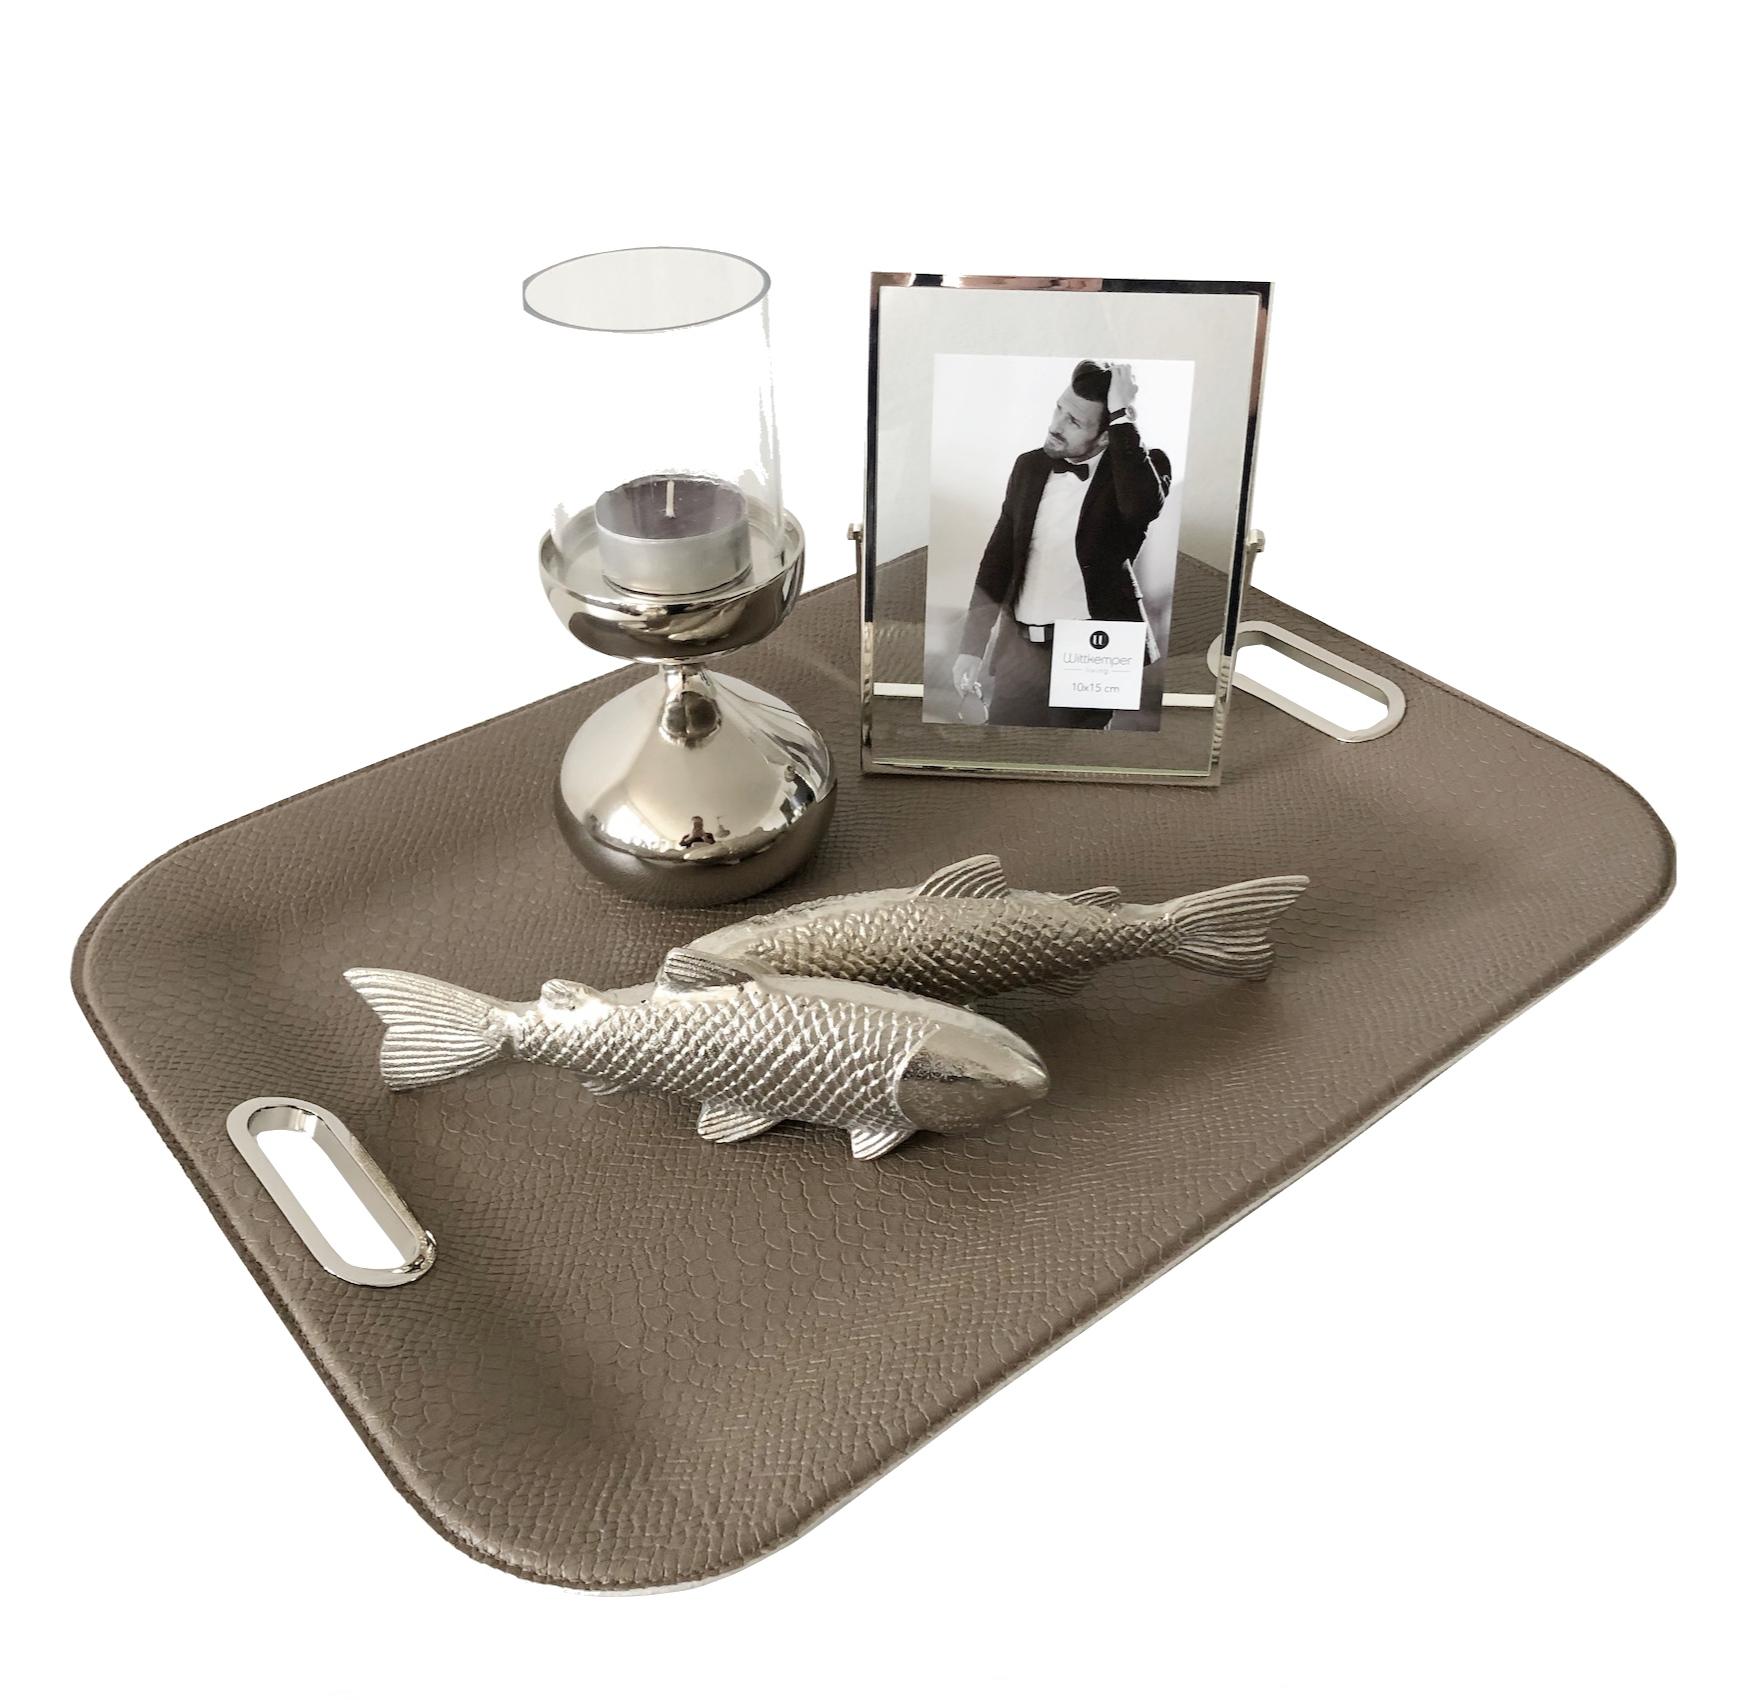 deko figur fisch silber alu metall maritim flourou. Black Bedroom Furniture Sets. Home Design Ideas